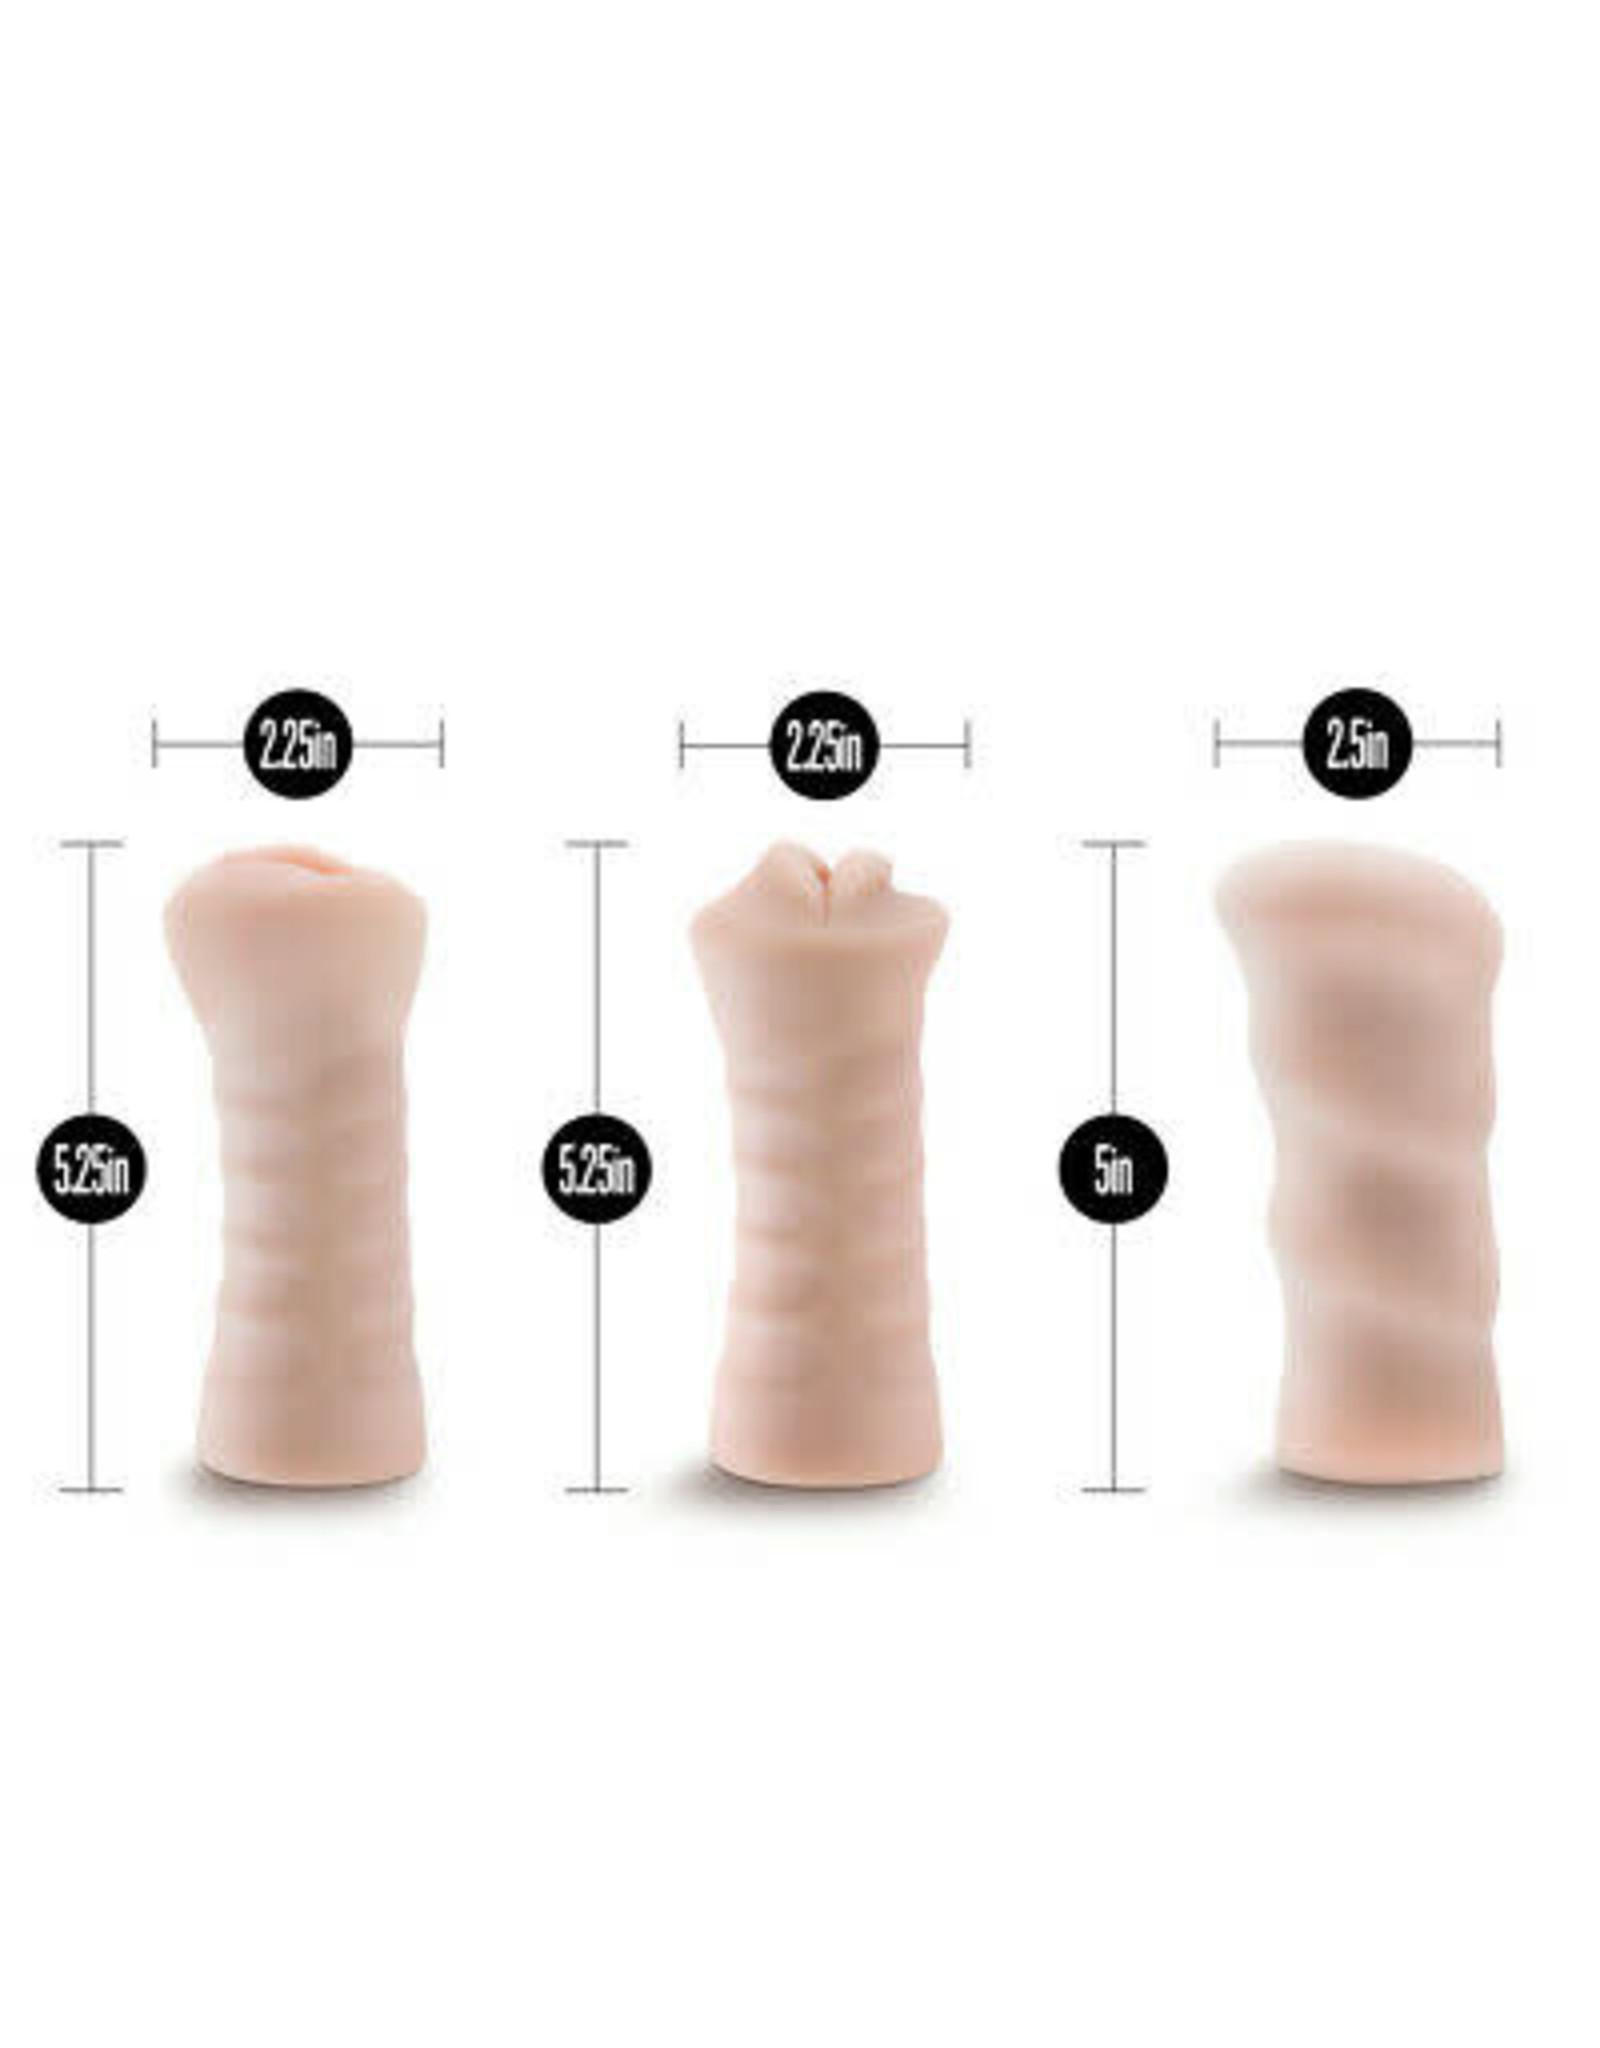 BLUSH BLUSH - M FOR MEN- 3-PAC SELF-LUBRICATING VIBRATING STROKER SLEEVE KIT